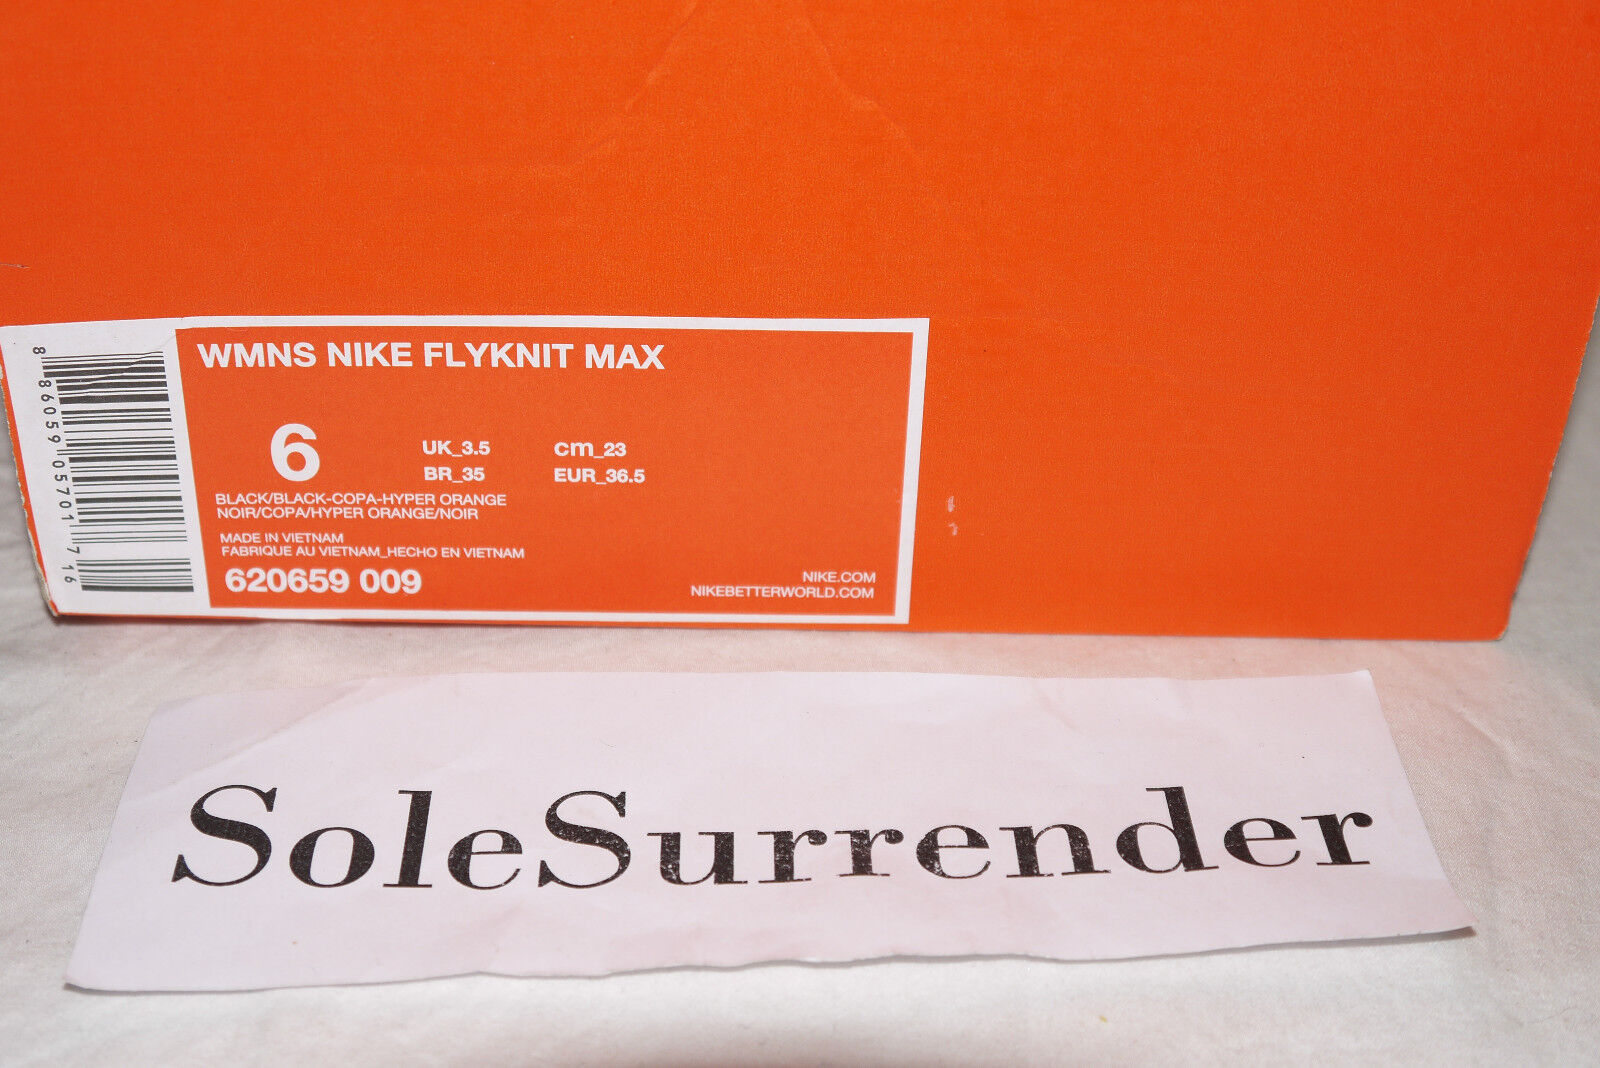 on sale d70bf f83a6 ... Women s Nike Flyknit Max Max Max - CHOOSE SIZE - 620659-009 Black Pink  Purple